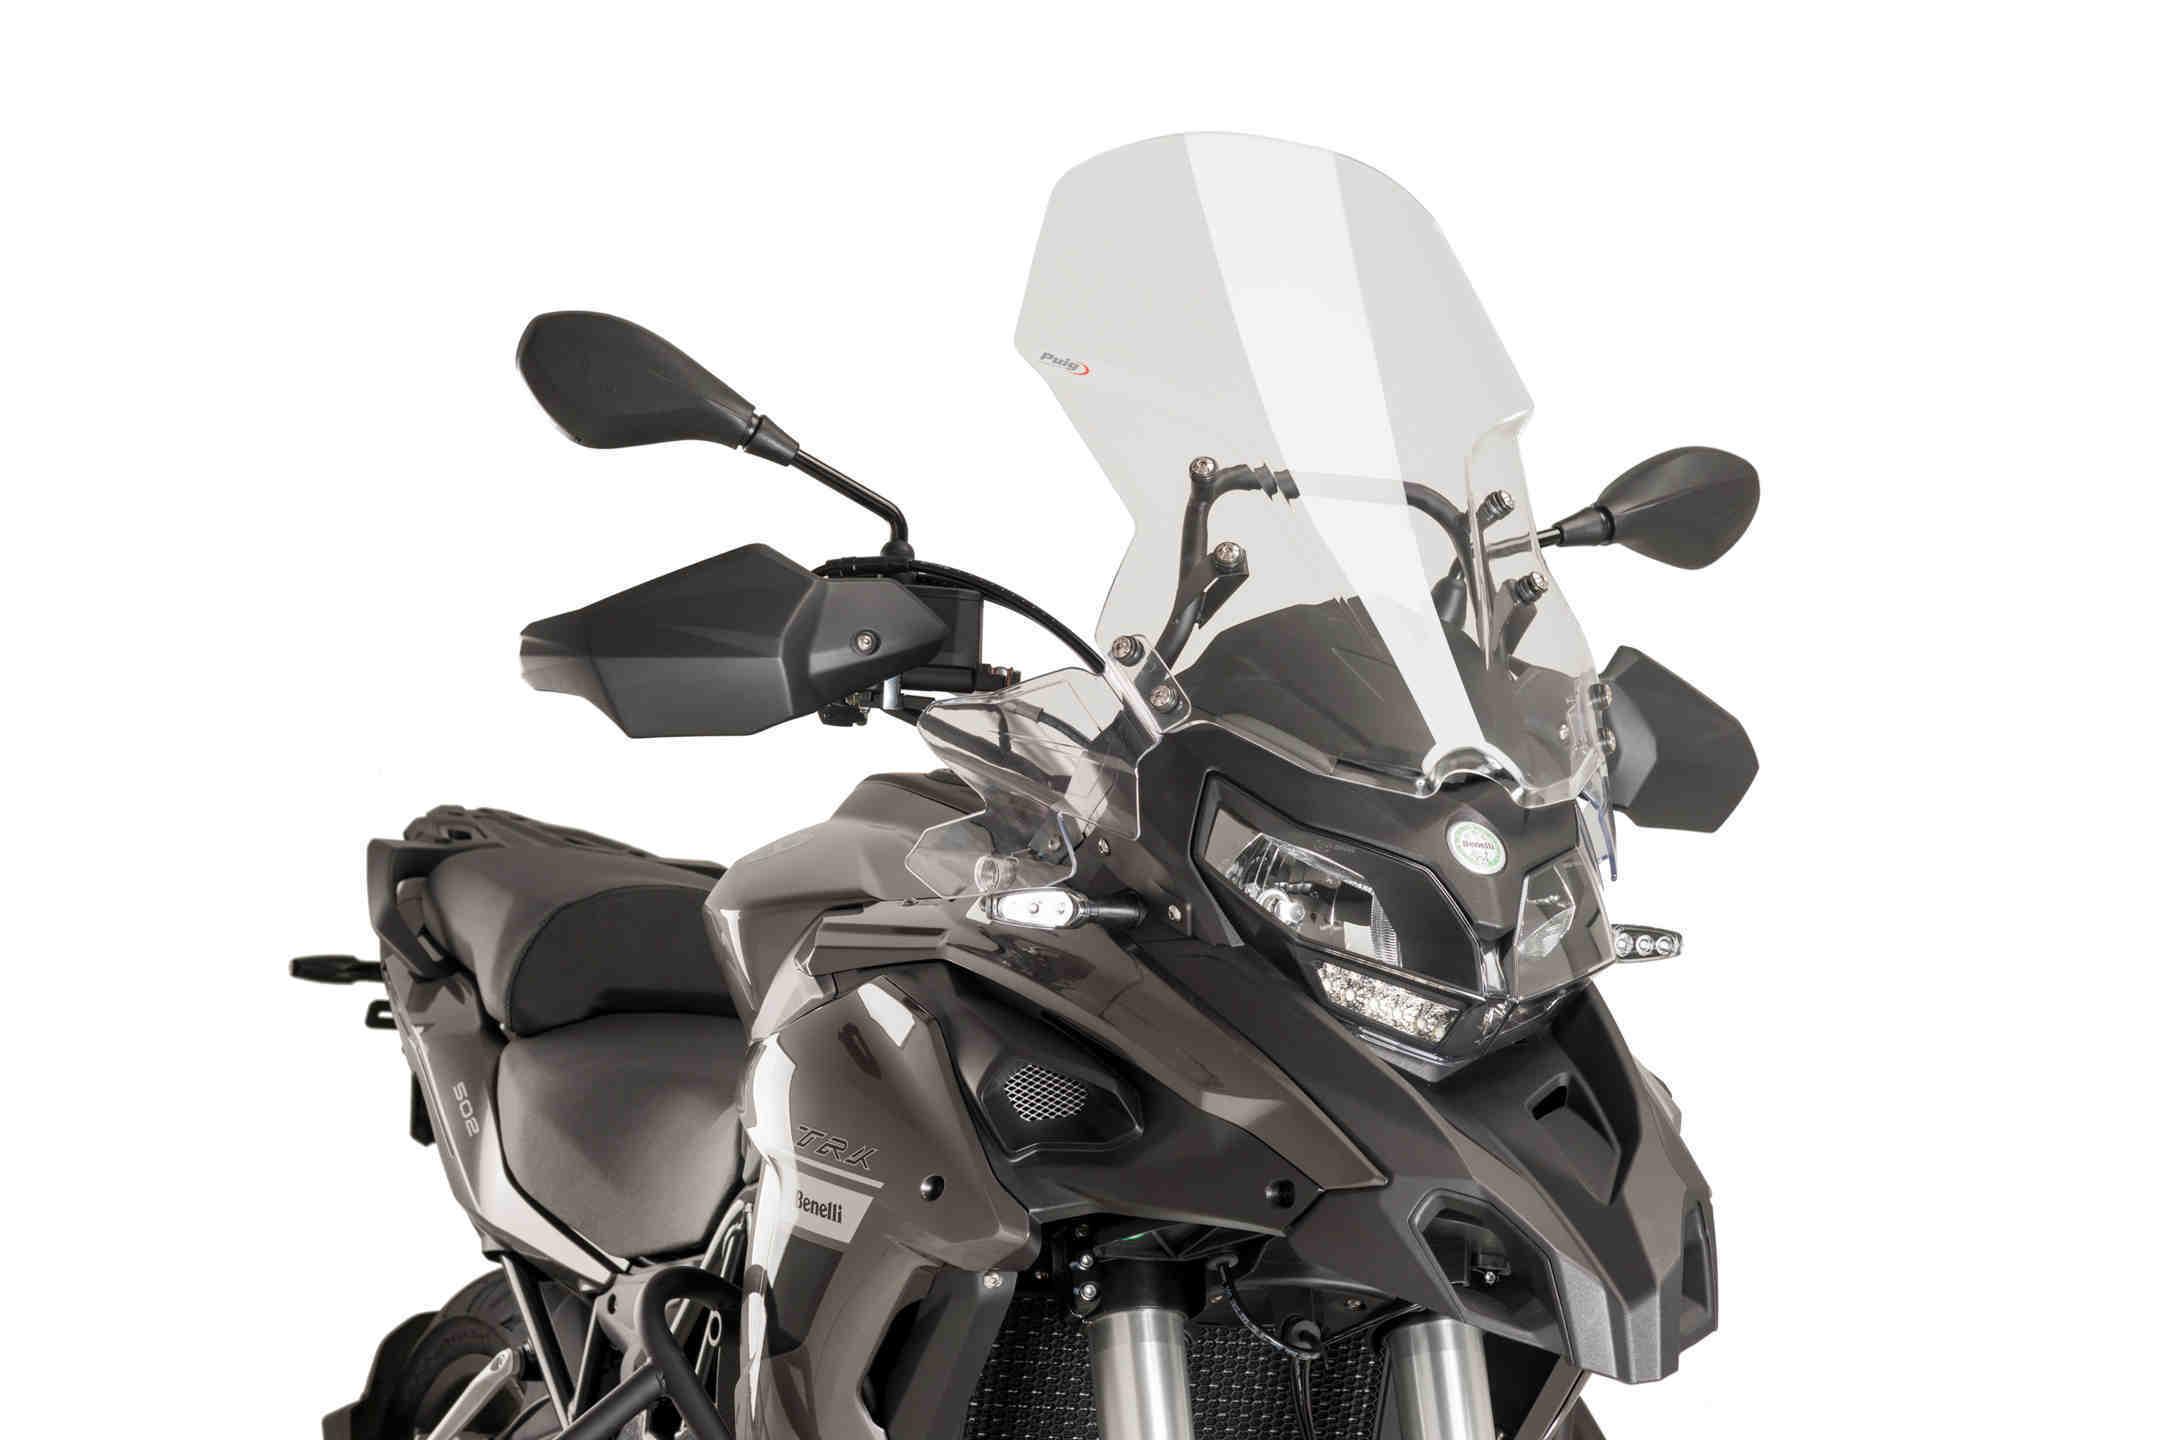 Cúpula Puig Touring para moto BENELLI TRK 502 16>